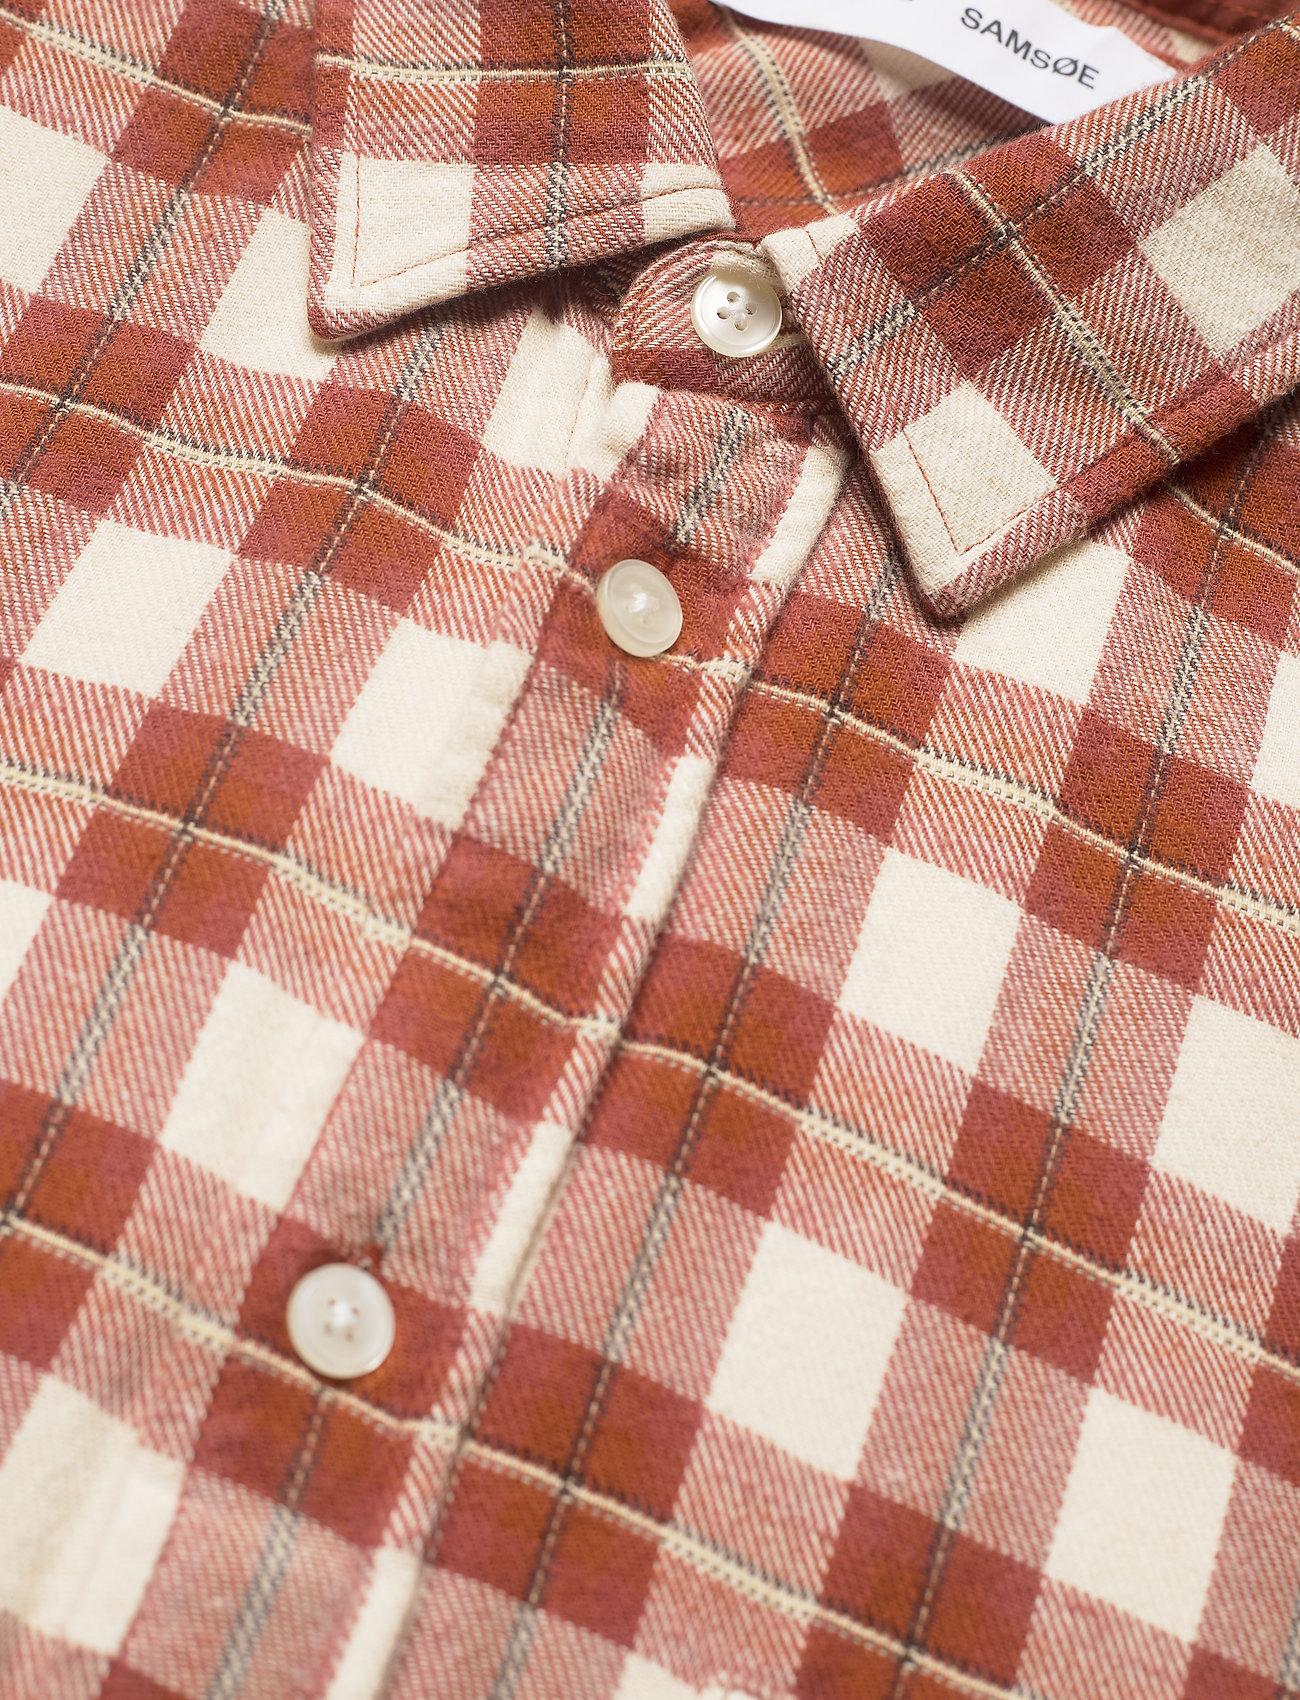 Samsøe Samsøe - Liam NP shirt 12961 - denimowe koszulki - brandy brown ch. - 3